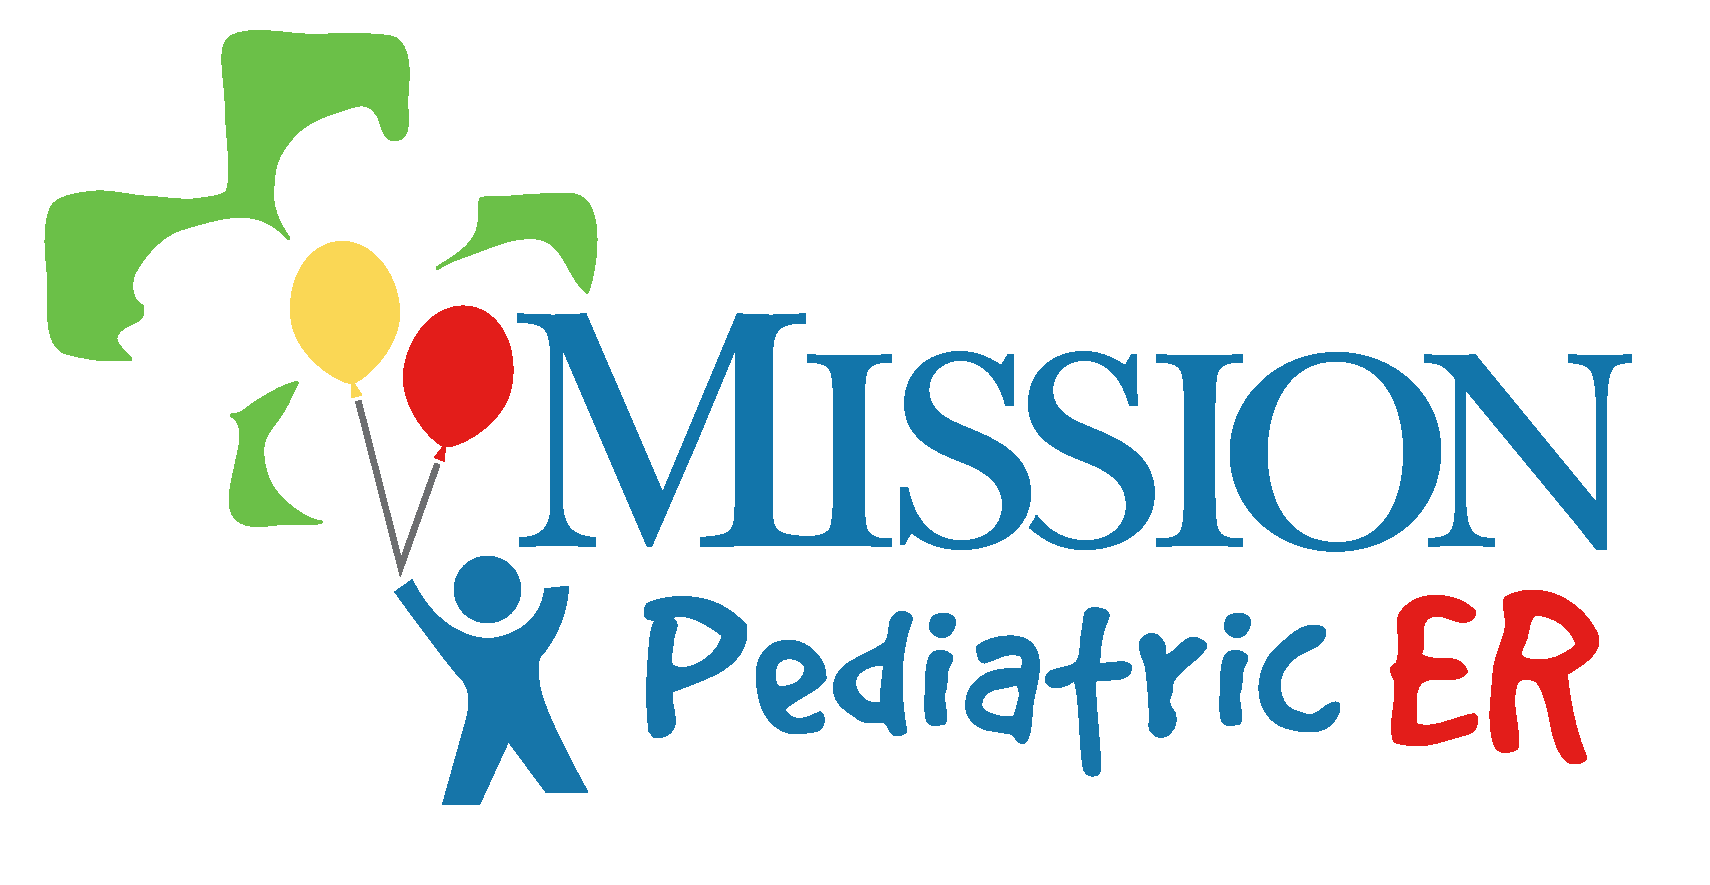 Mission Pediatric ER